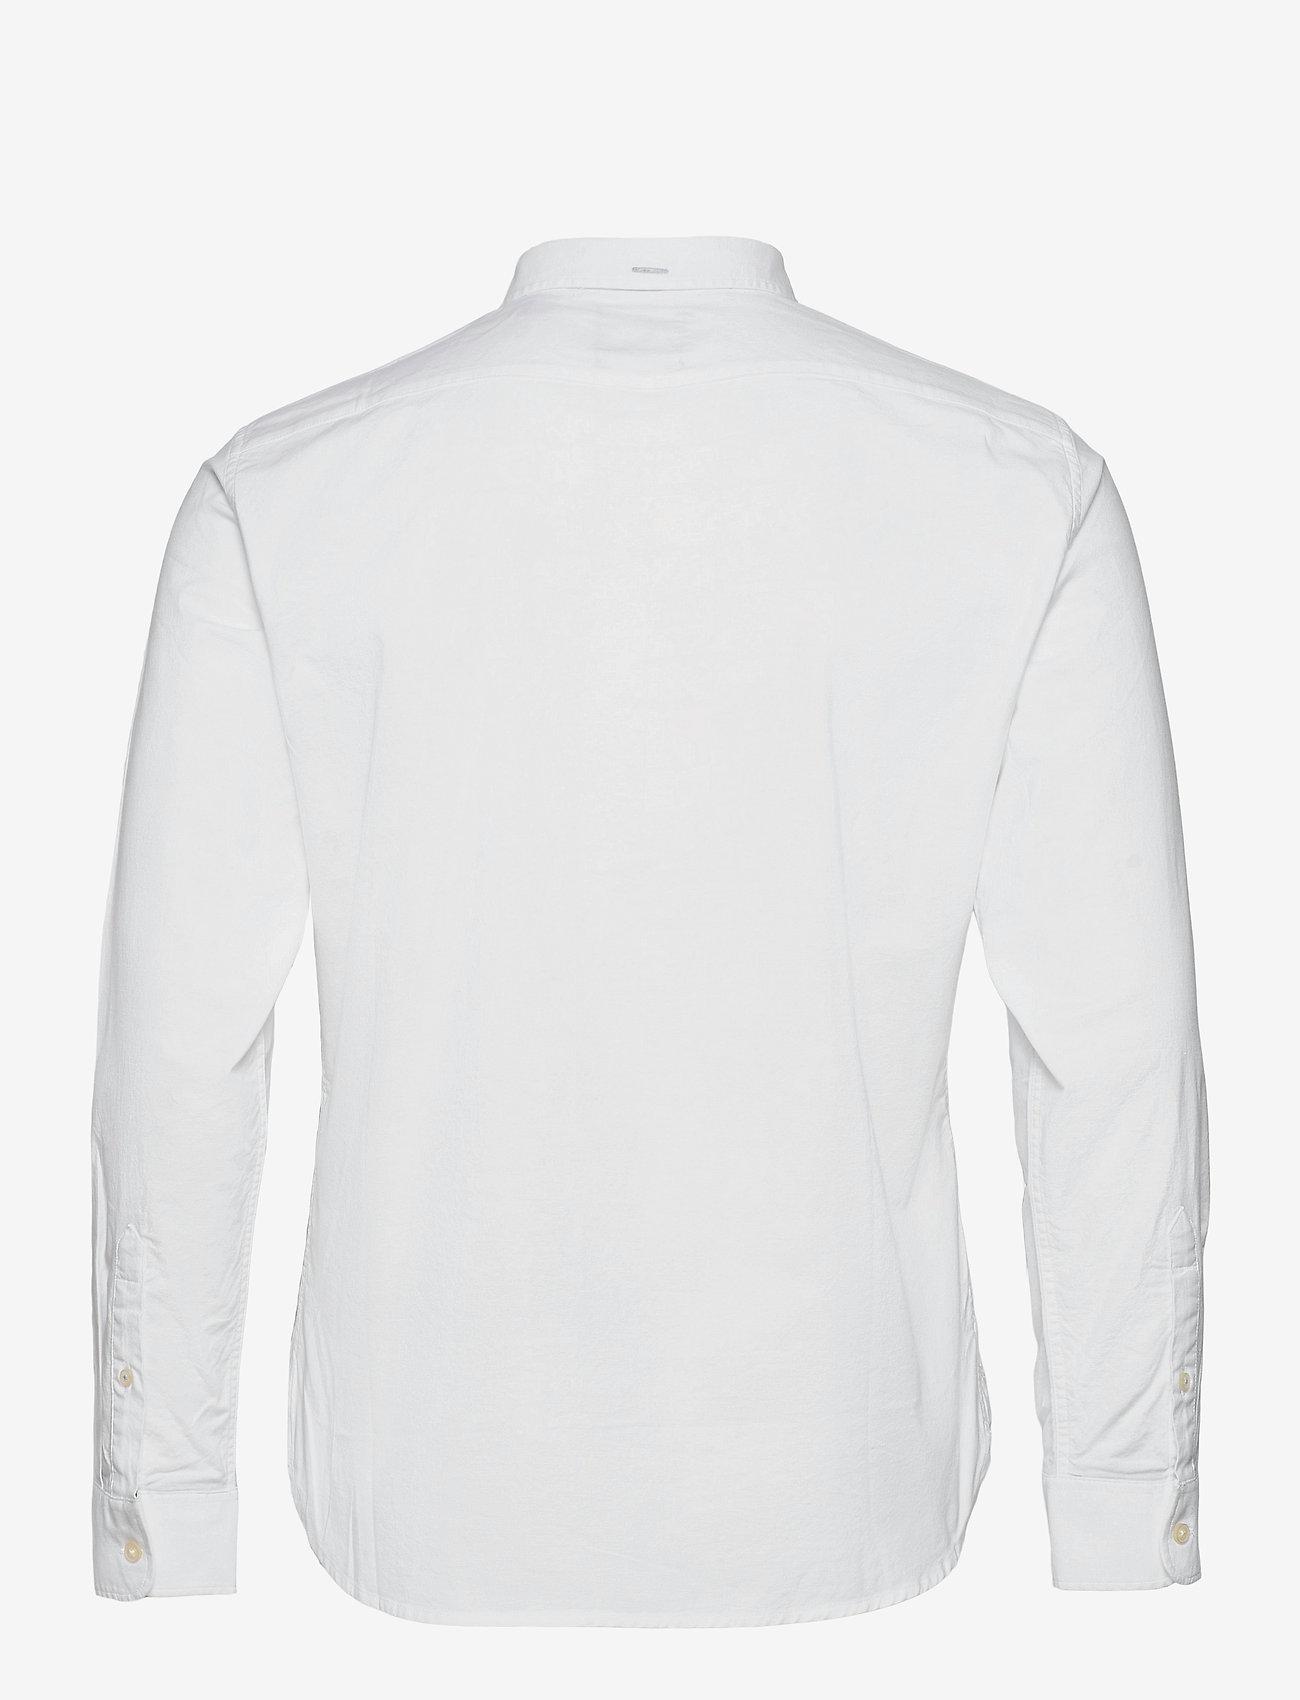 Dockers - OXFORD 2.0 PAPER WHITE - podstawowe koszulki - neutrals - 1